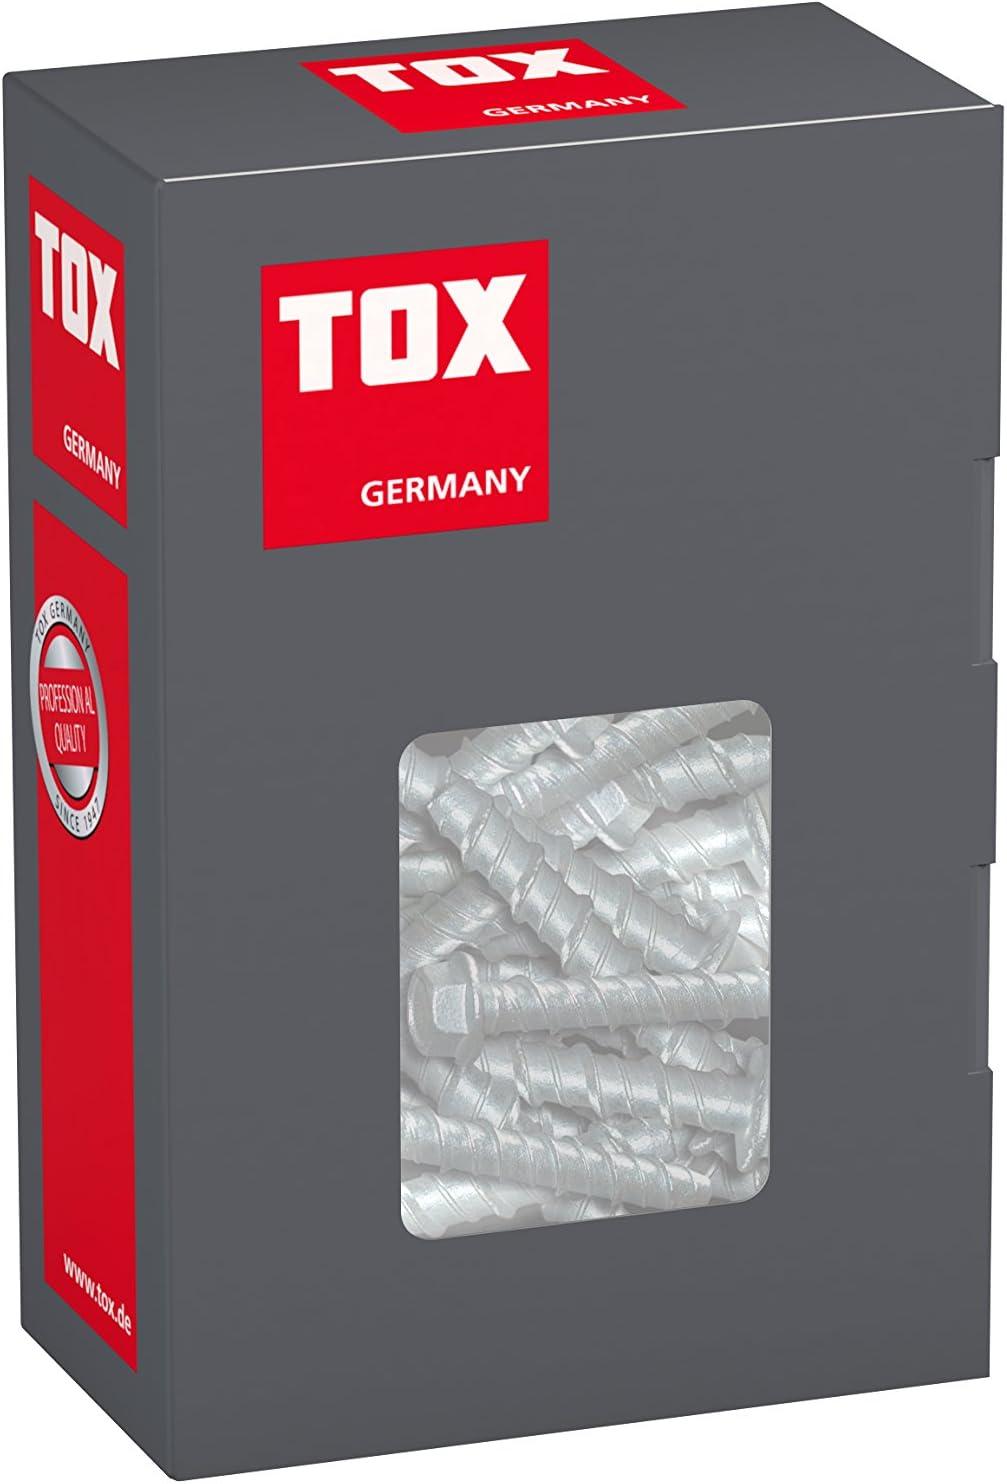 50 St/ück 8x75 mm TOX Betonschraube Sumo Pro 1 041101021